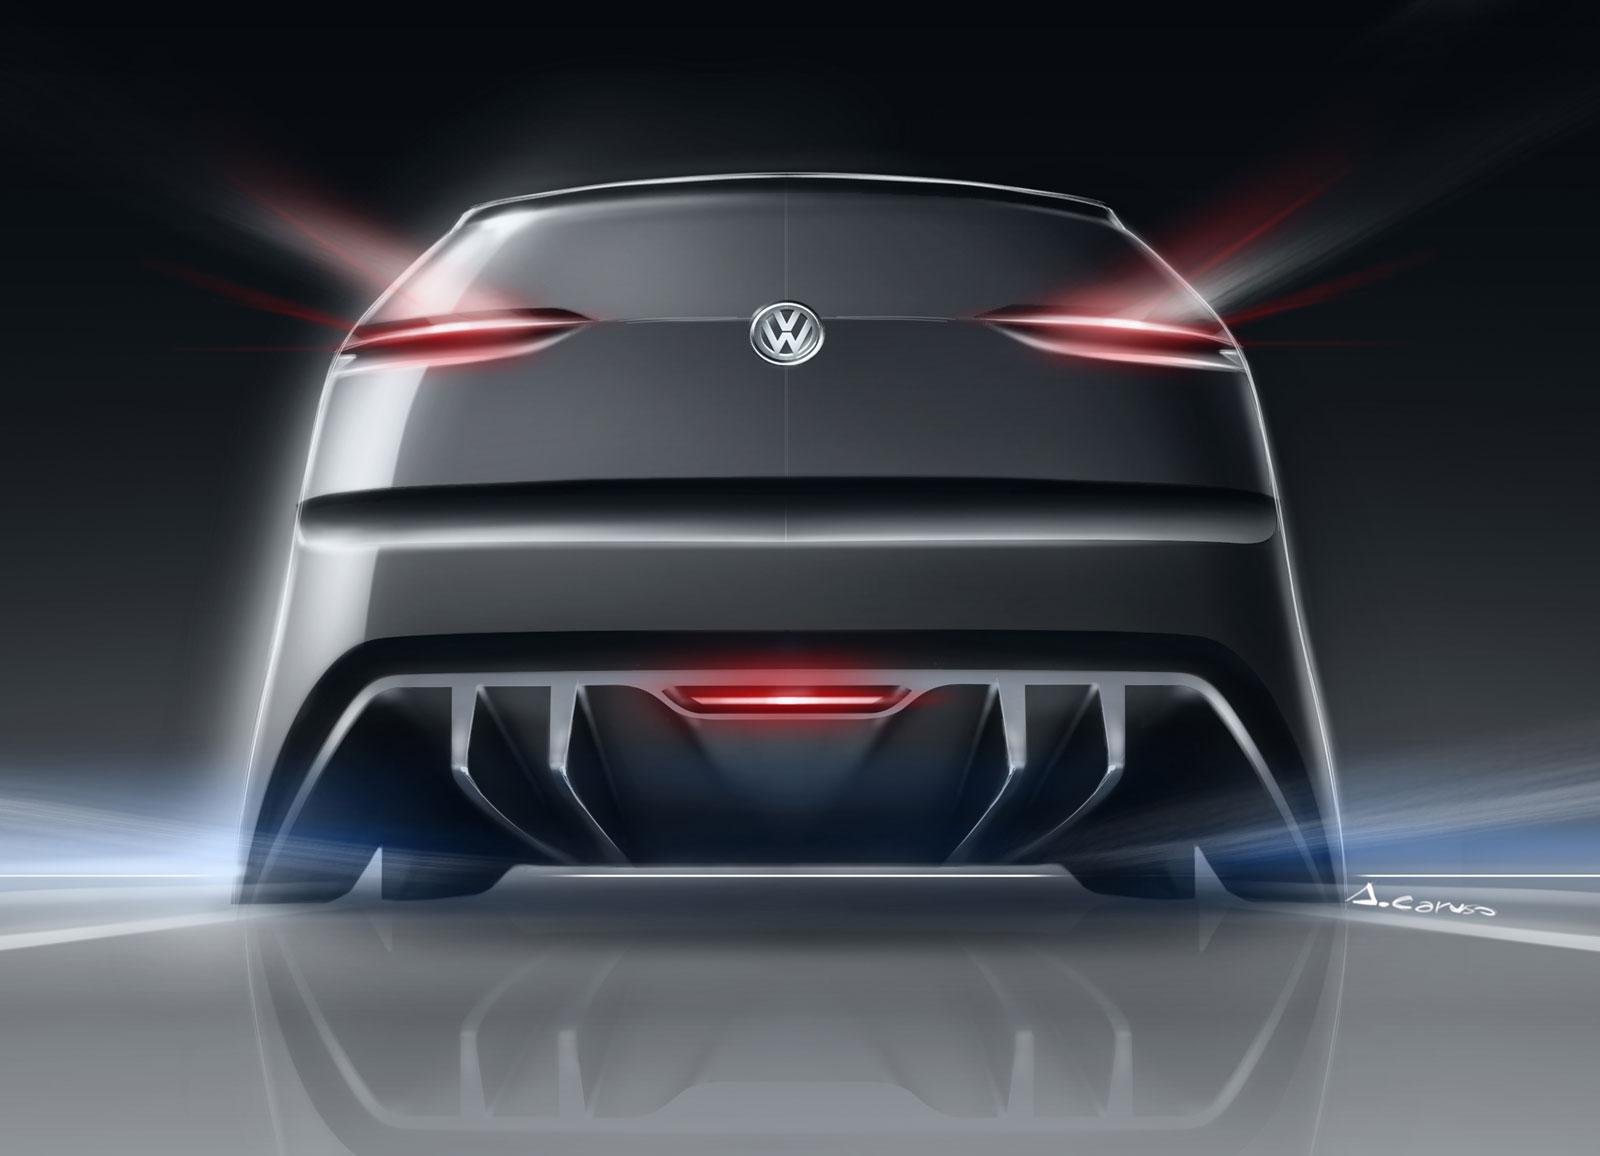 BMW X6 M >> Volkswagen Golf Vision 2020 Concept - Design sketch - Car ...